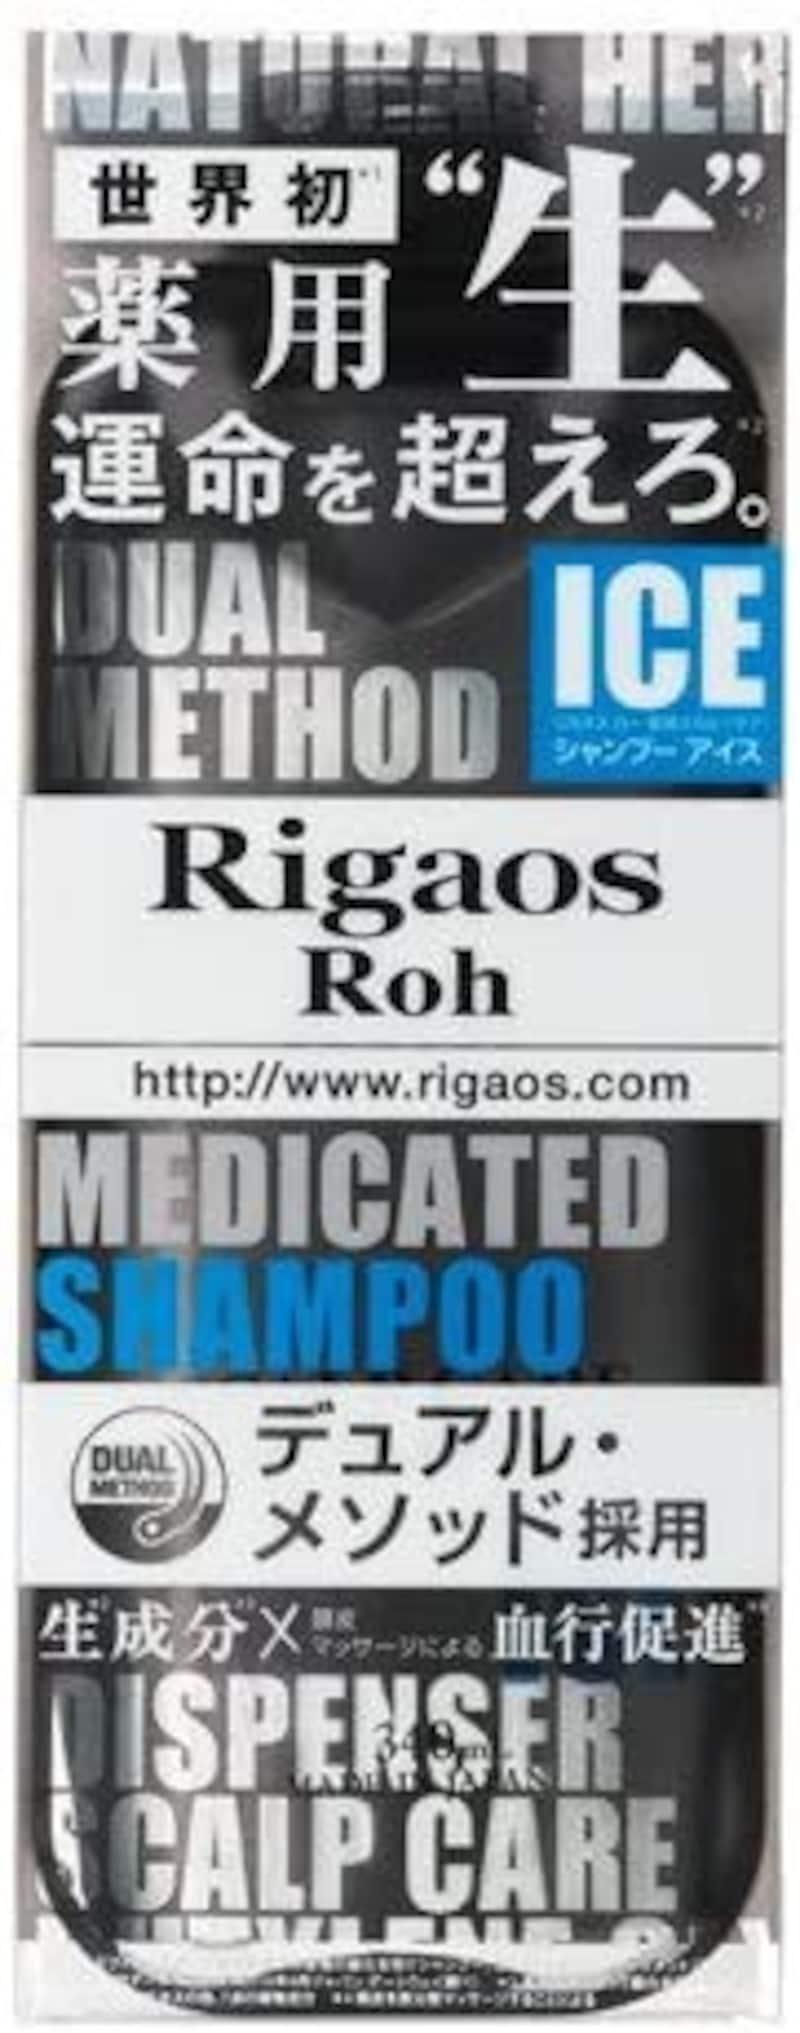 Rigaos(リガオス),薬用スカルプケア シャンプー ICE